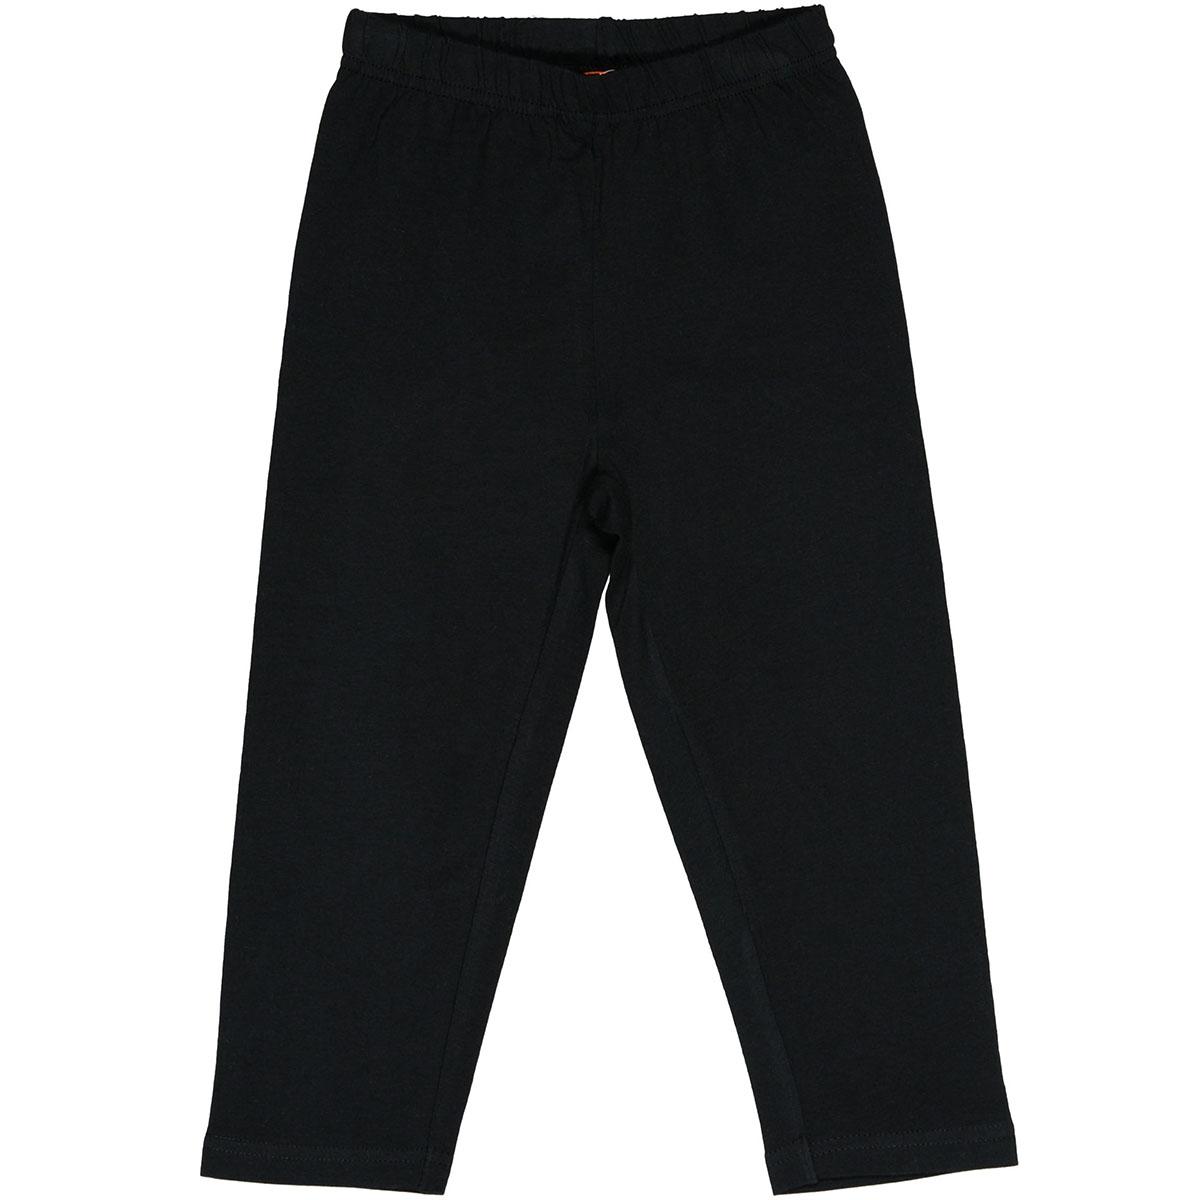 staccato m dchen capri leggings kids schwarz 230062764 ebay. Black Bedroom Furniture Sets. Home Design Ideas